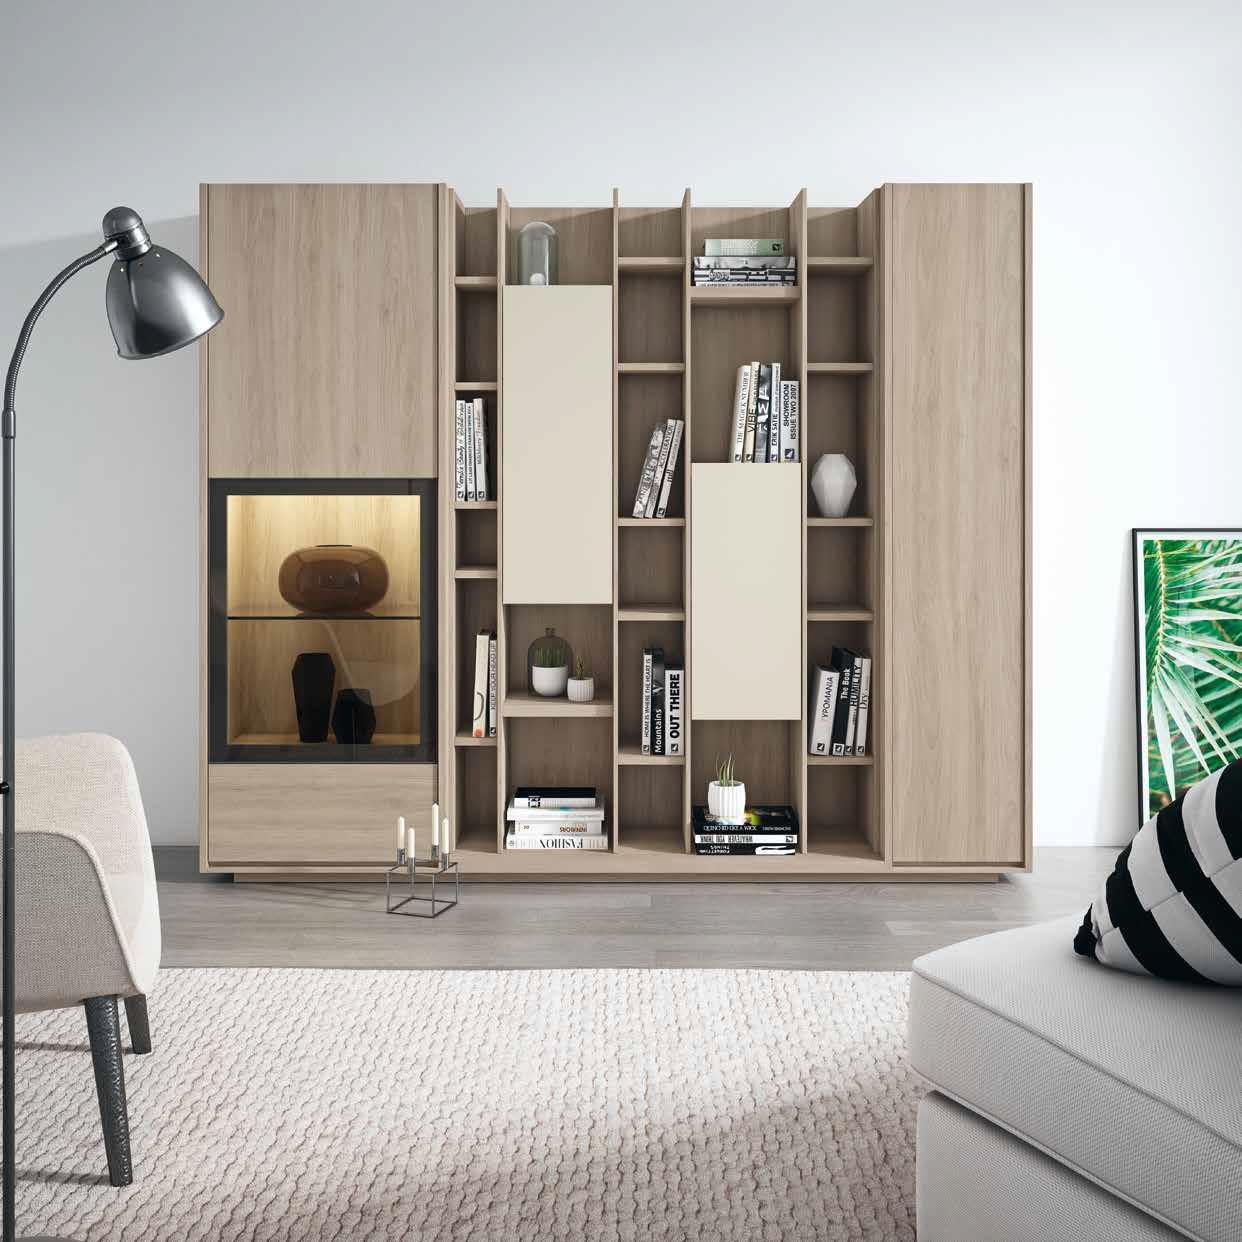 salon-moderno-Nativ-2019-muebles-paco-caballero-0920-5c8ceab2614d6